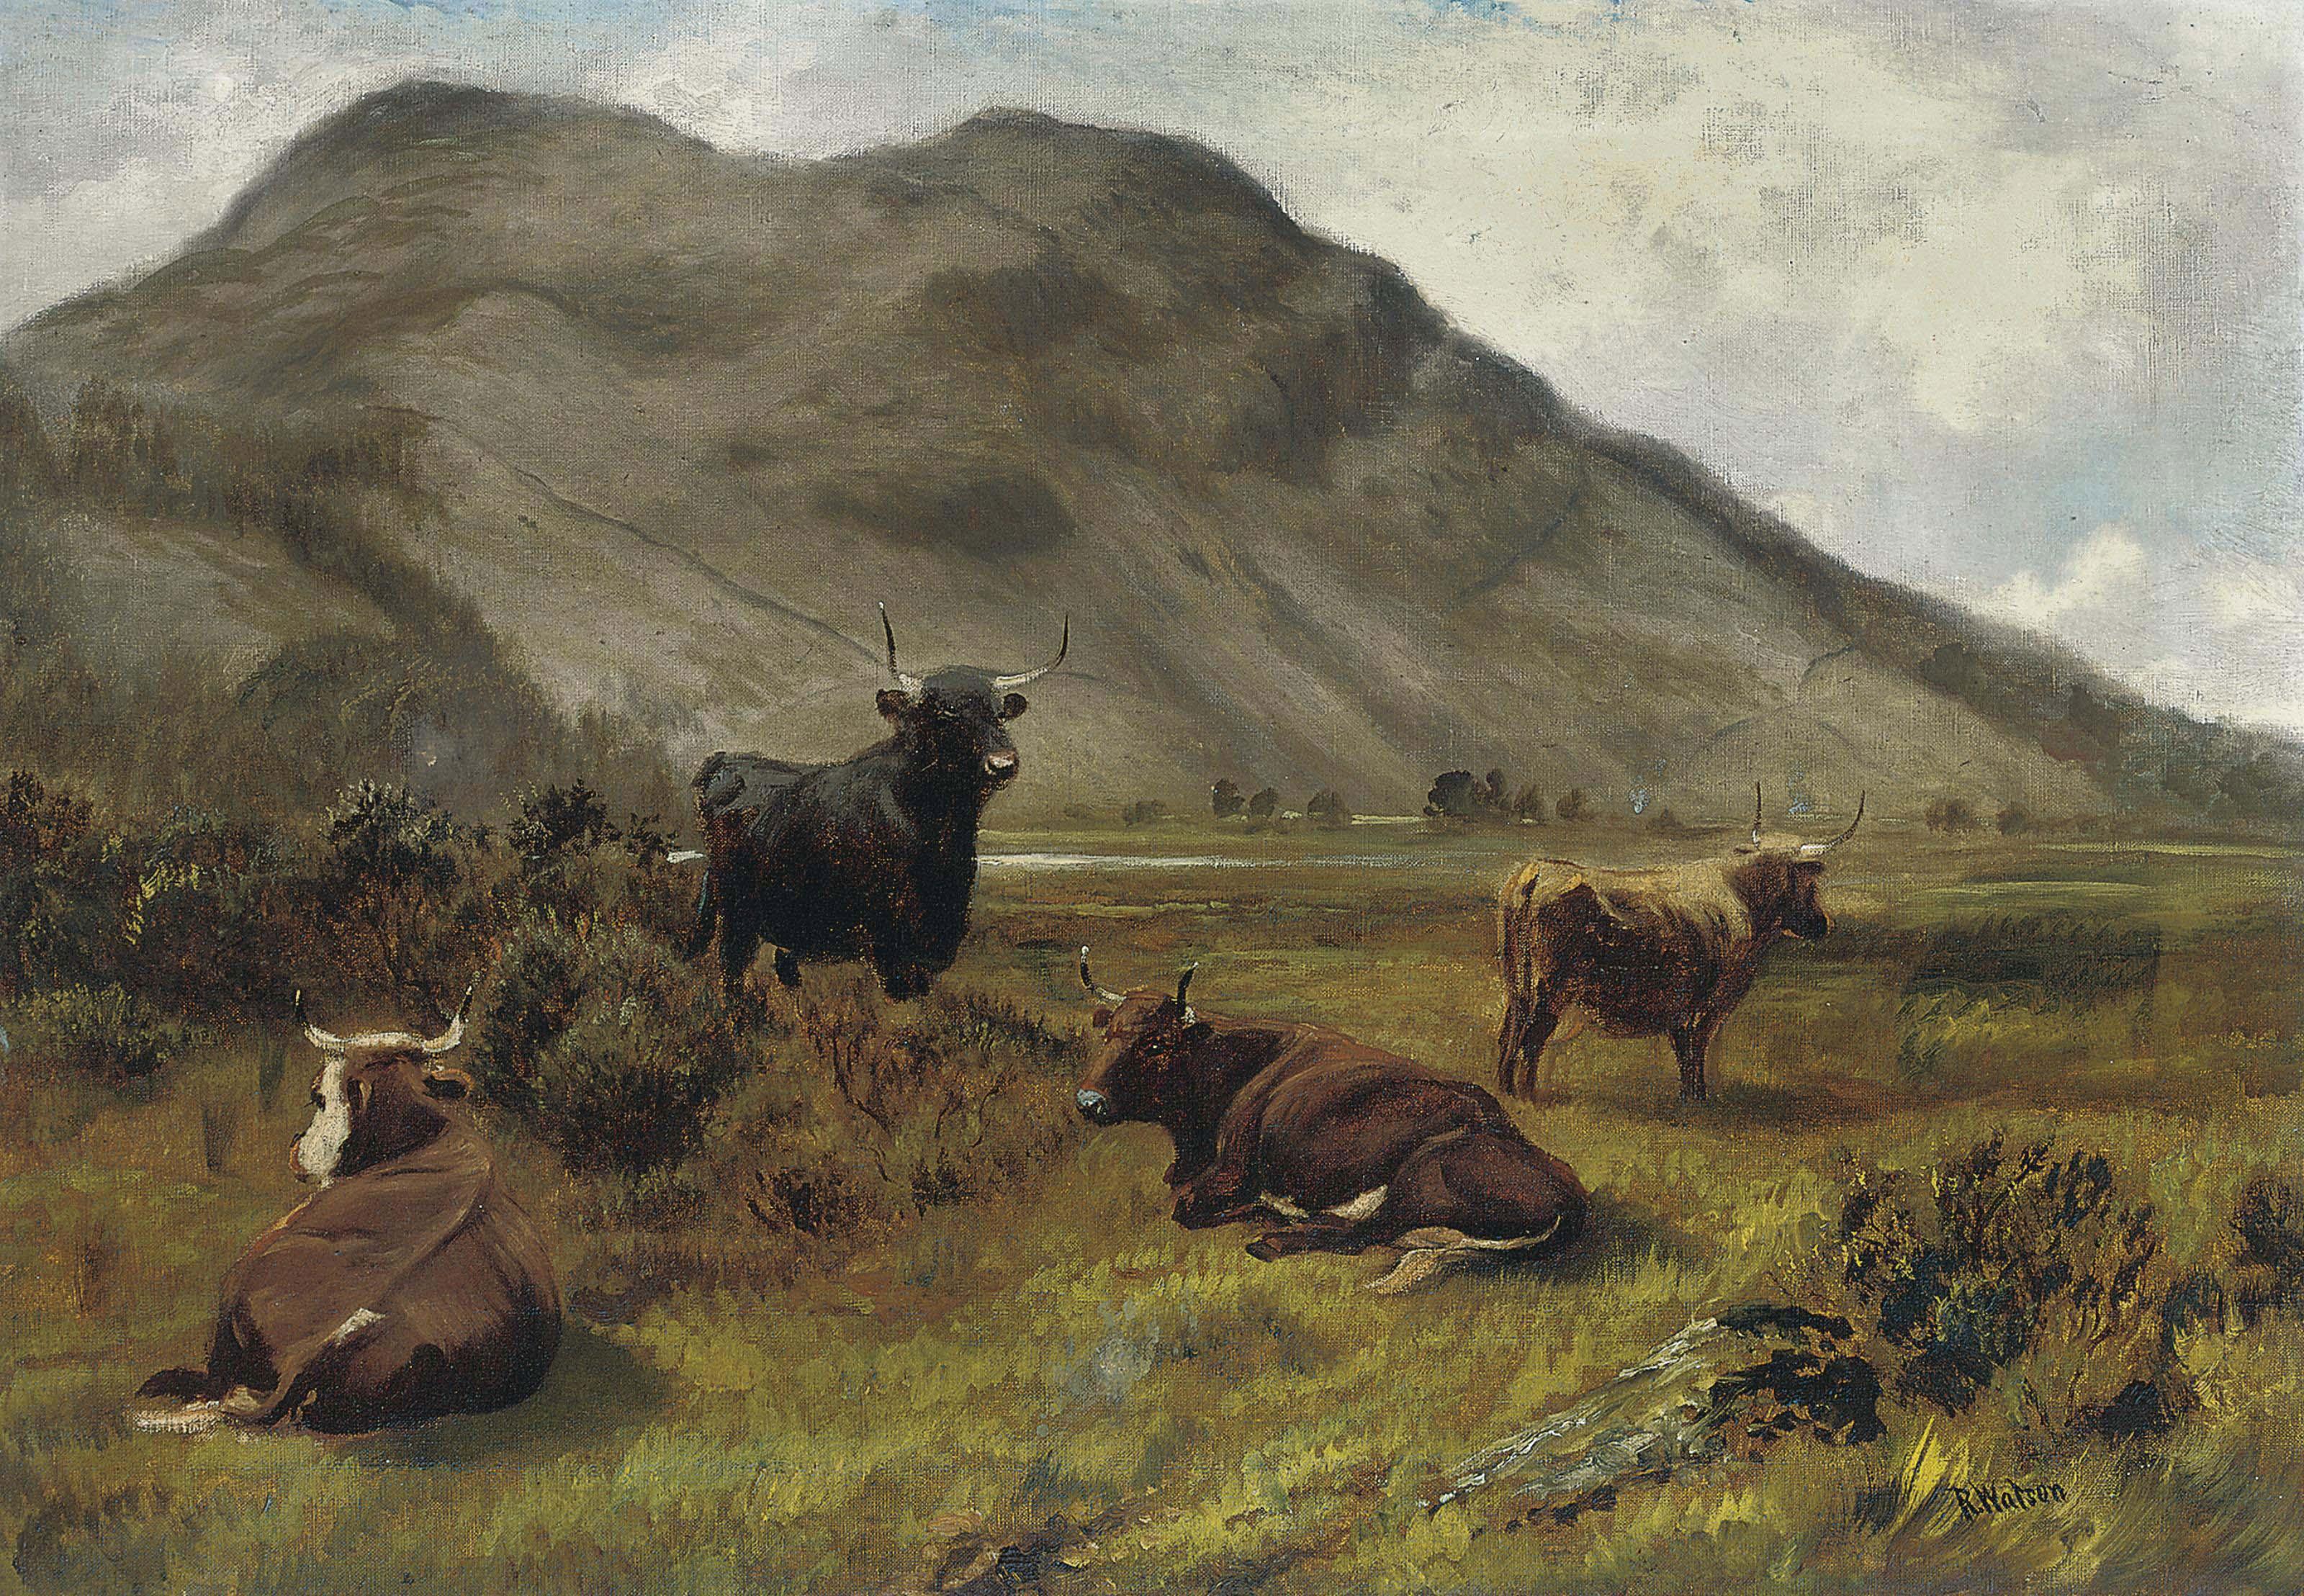 Cattle grazing in a highland landscape